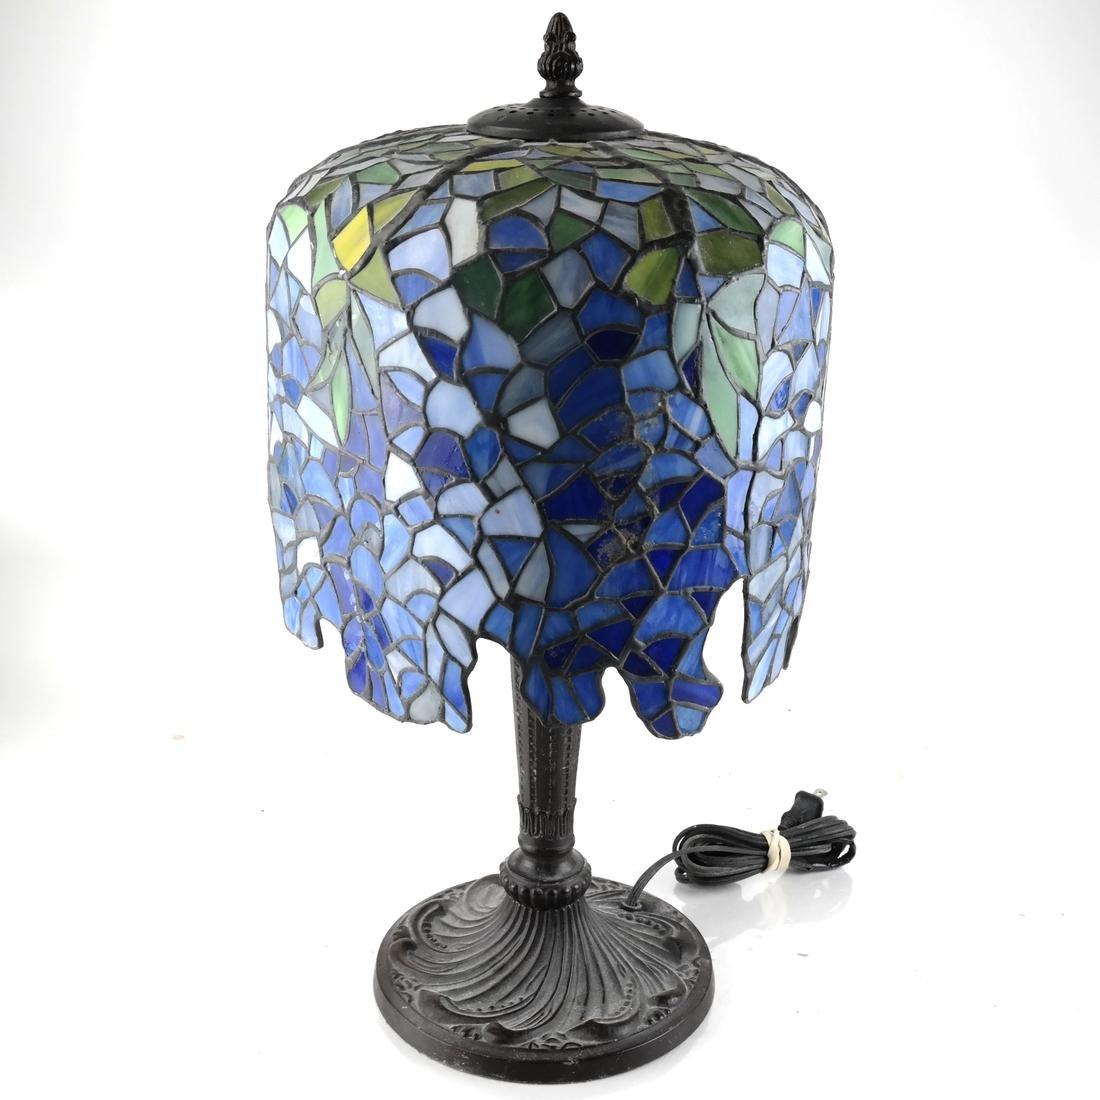 Tiffany-Style Wisteria Design Table Lamp